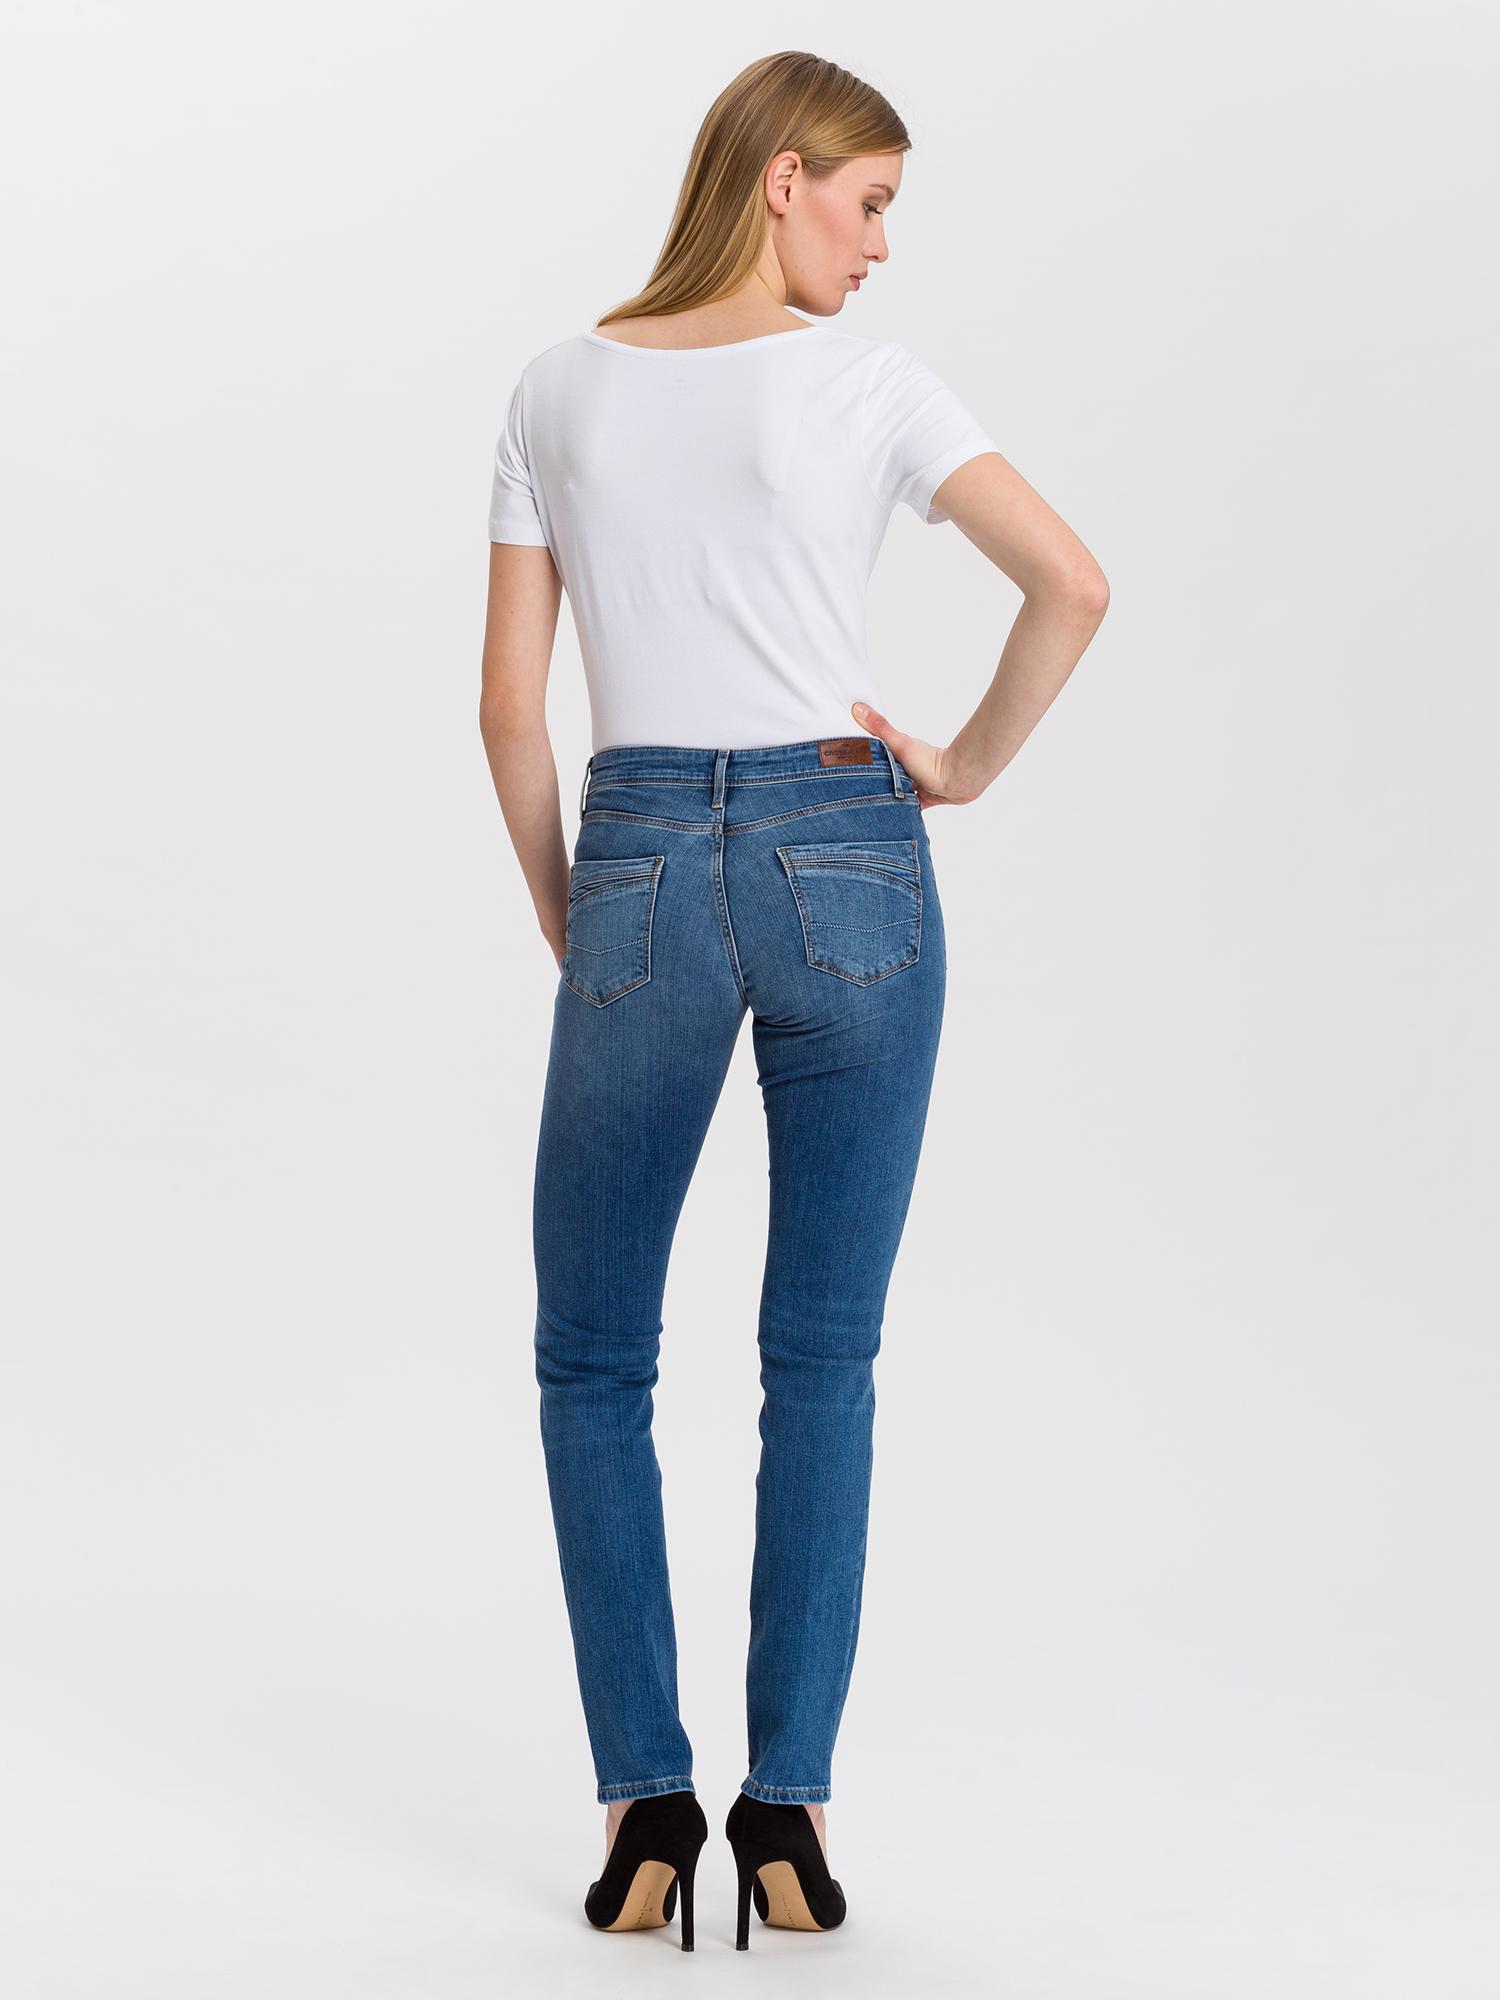 Cross Jeans Anya Slim Fit L36 Inch, soft blue used